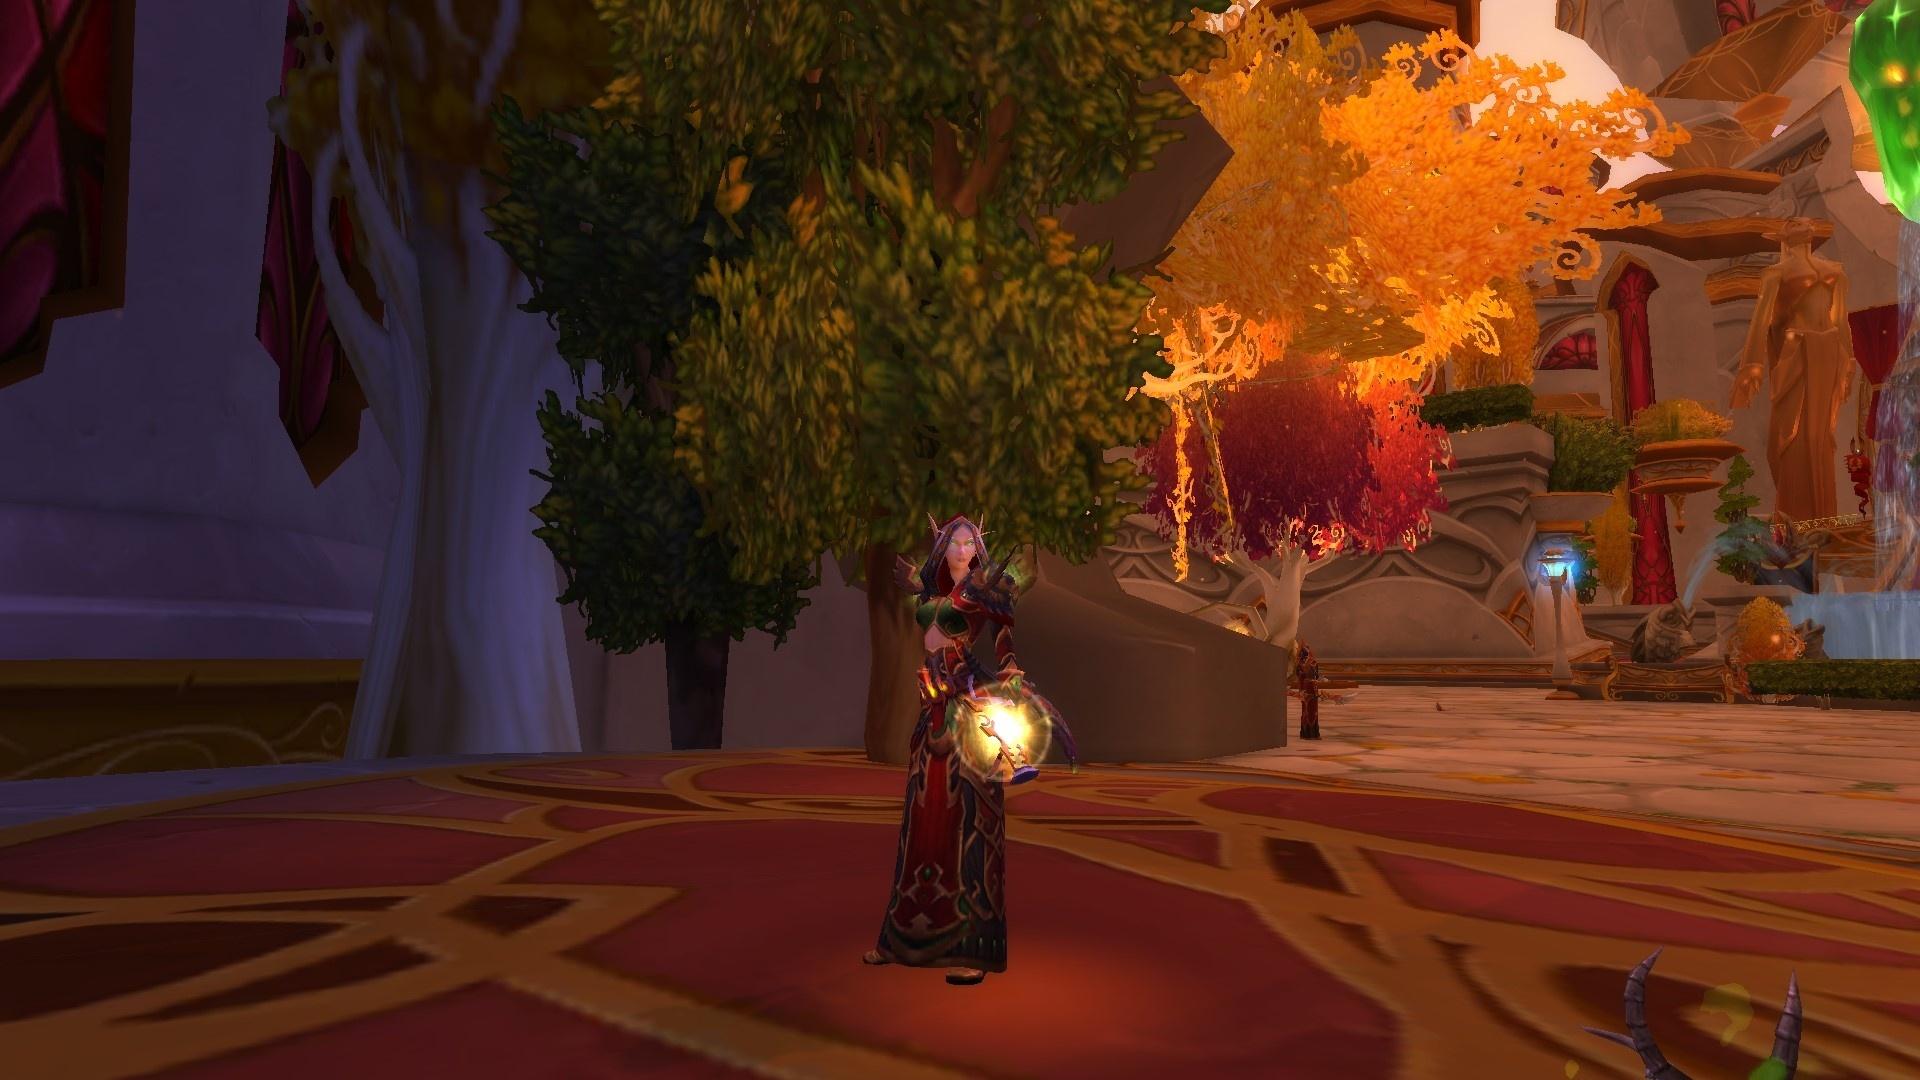 Blood Elf Heritage Armor Questline (8 1 Spoilers) - Wowhead News